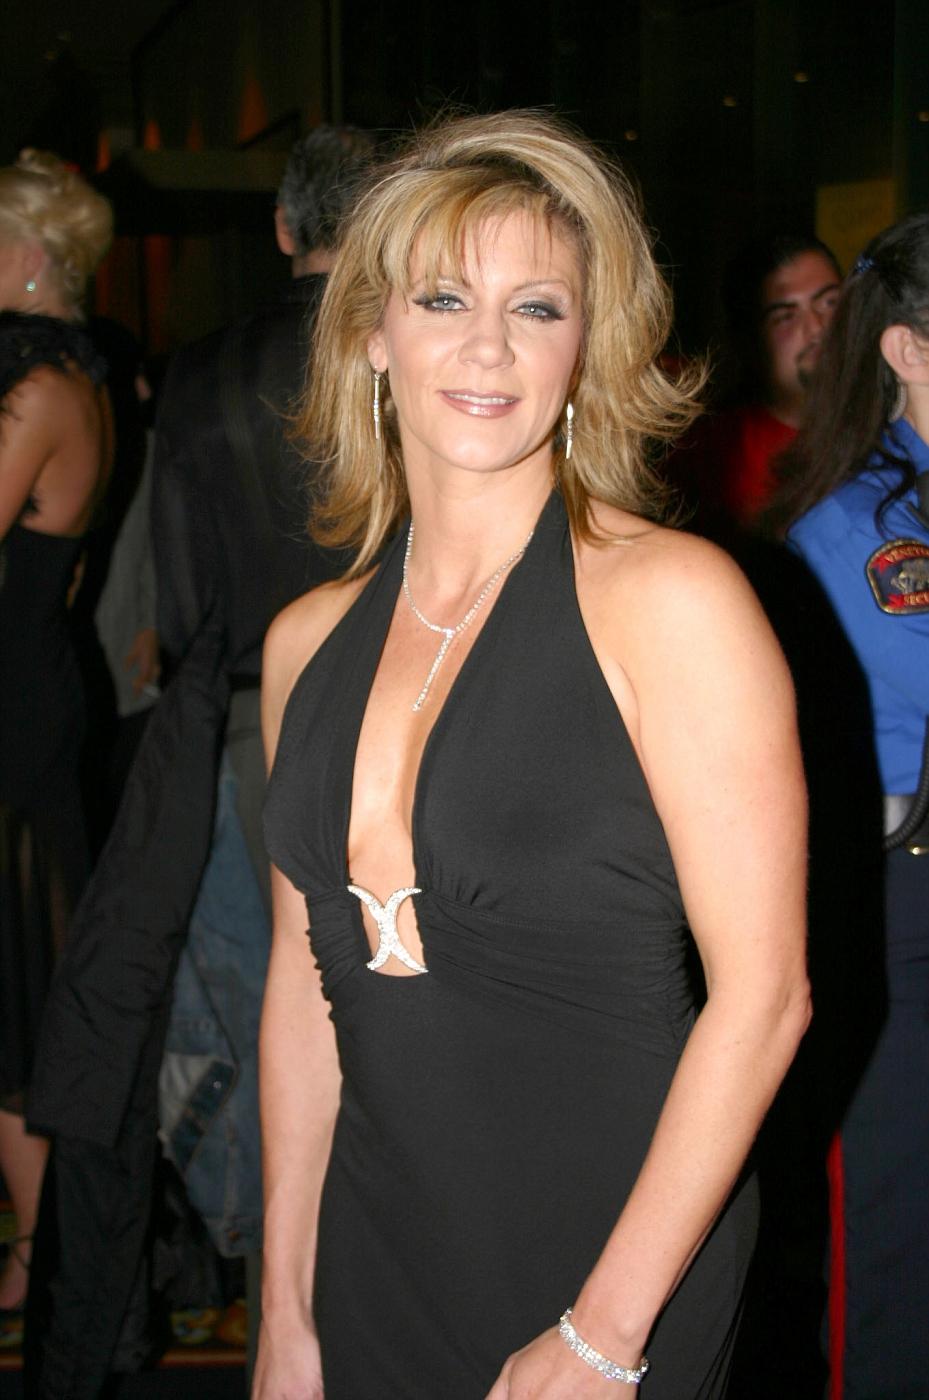 Chloe Dallimore,Joanna Taylor (born 1978) Hot picture Janet Alexander,Nancy Lee Grahn